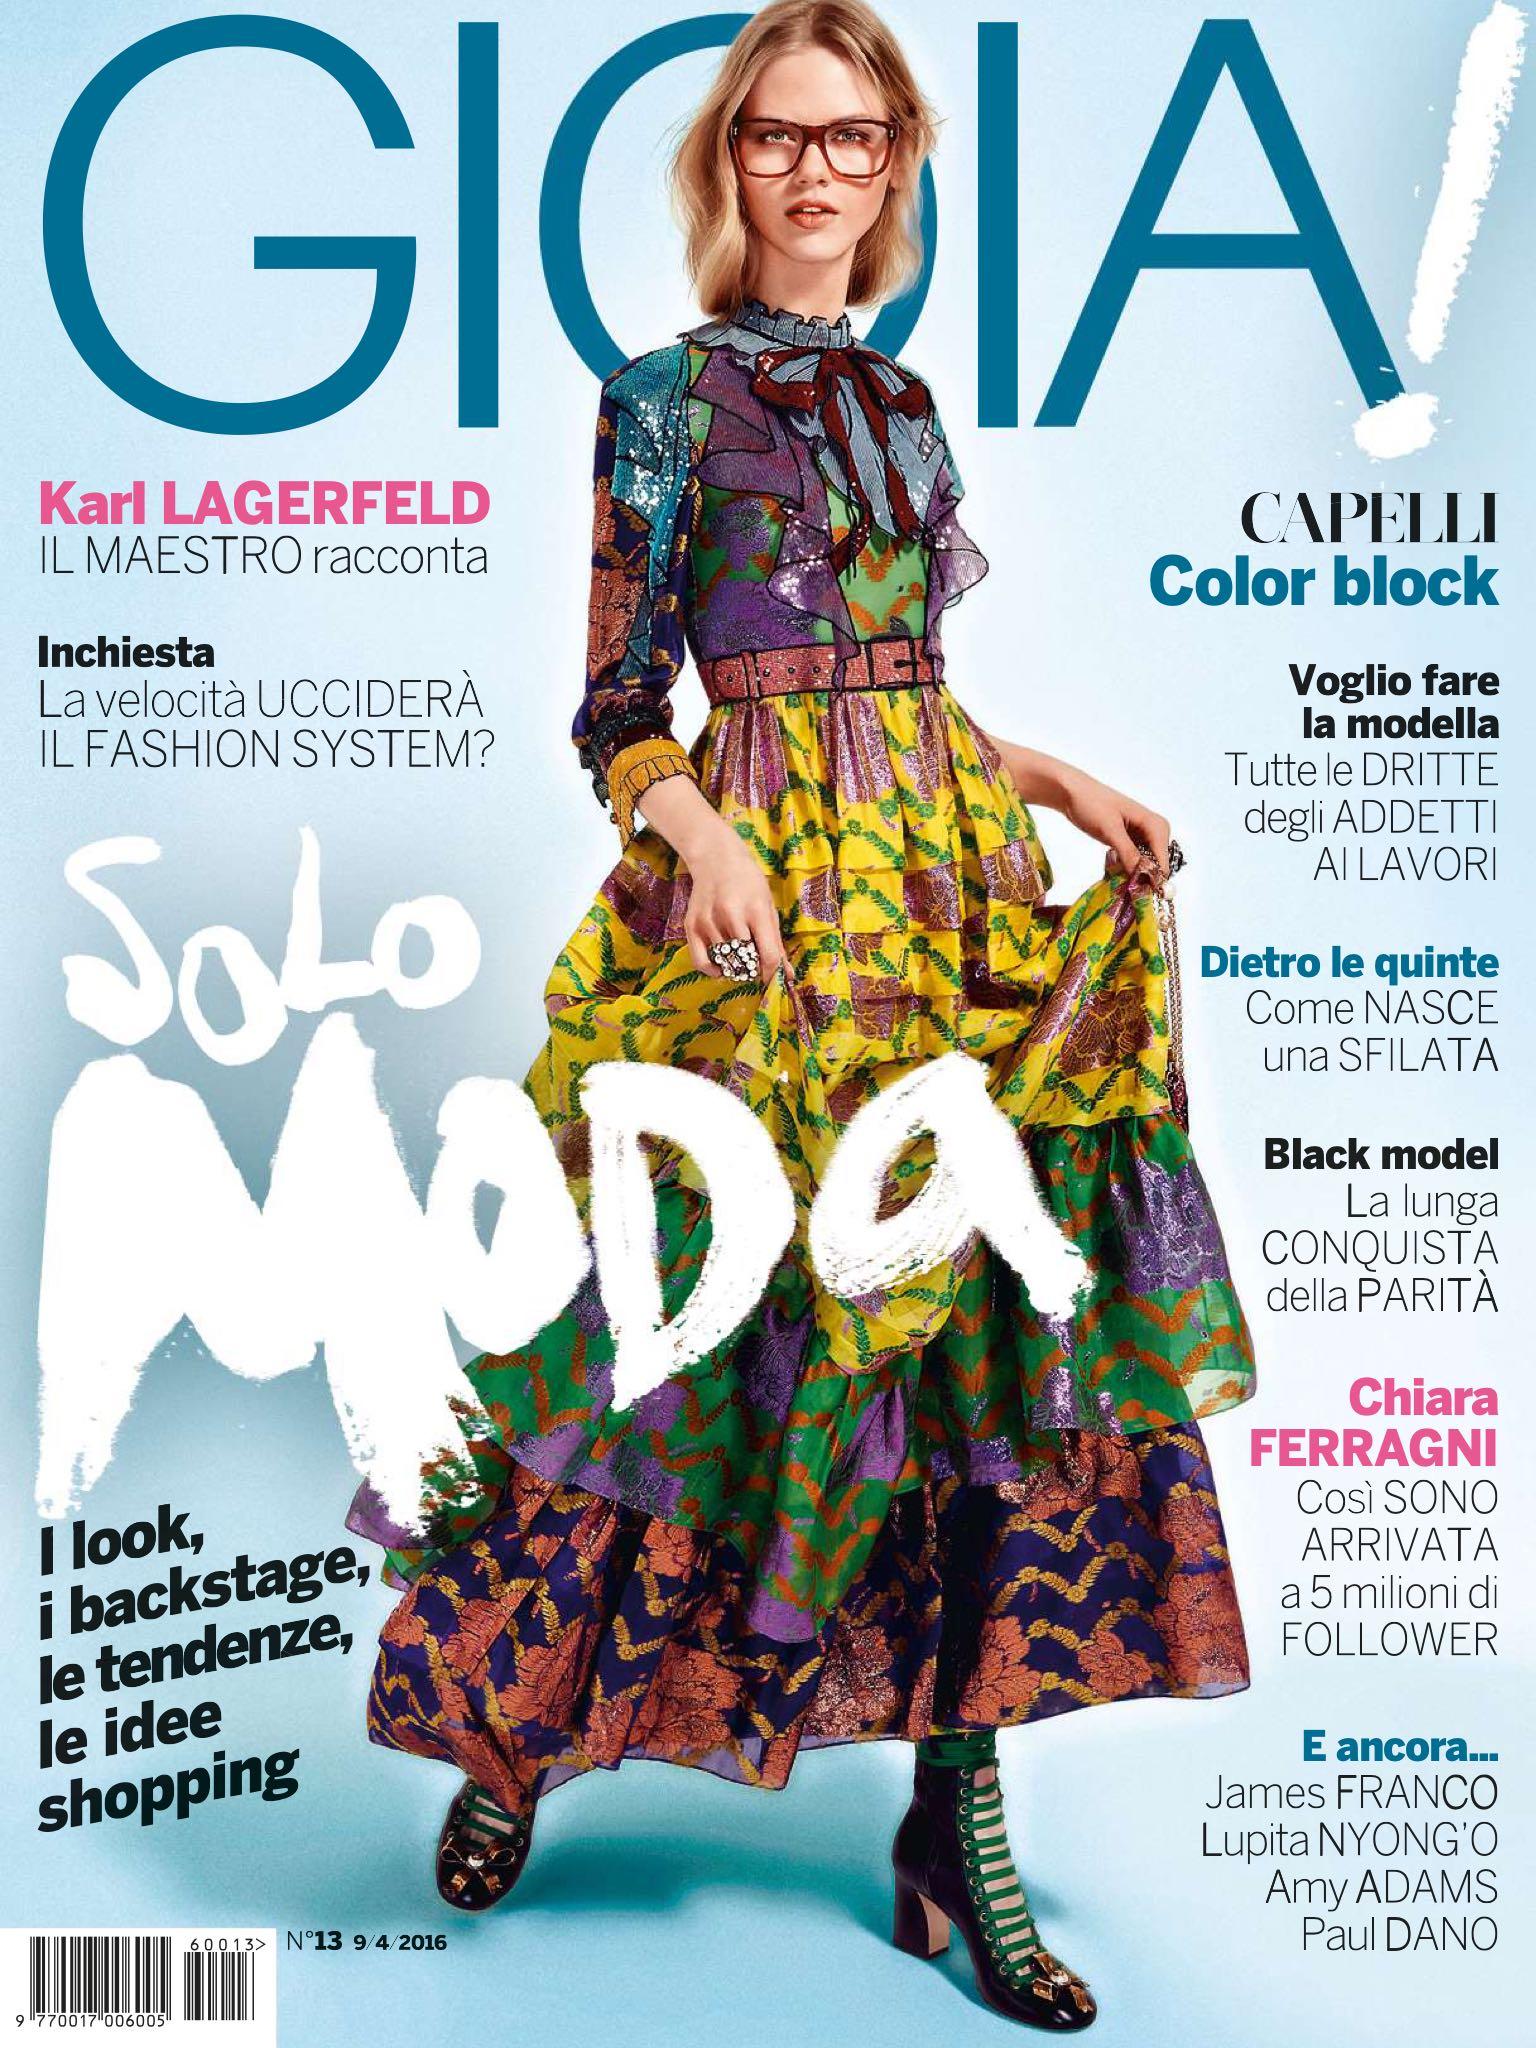 GIOIA! Magazine 13